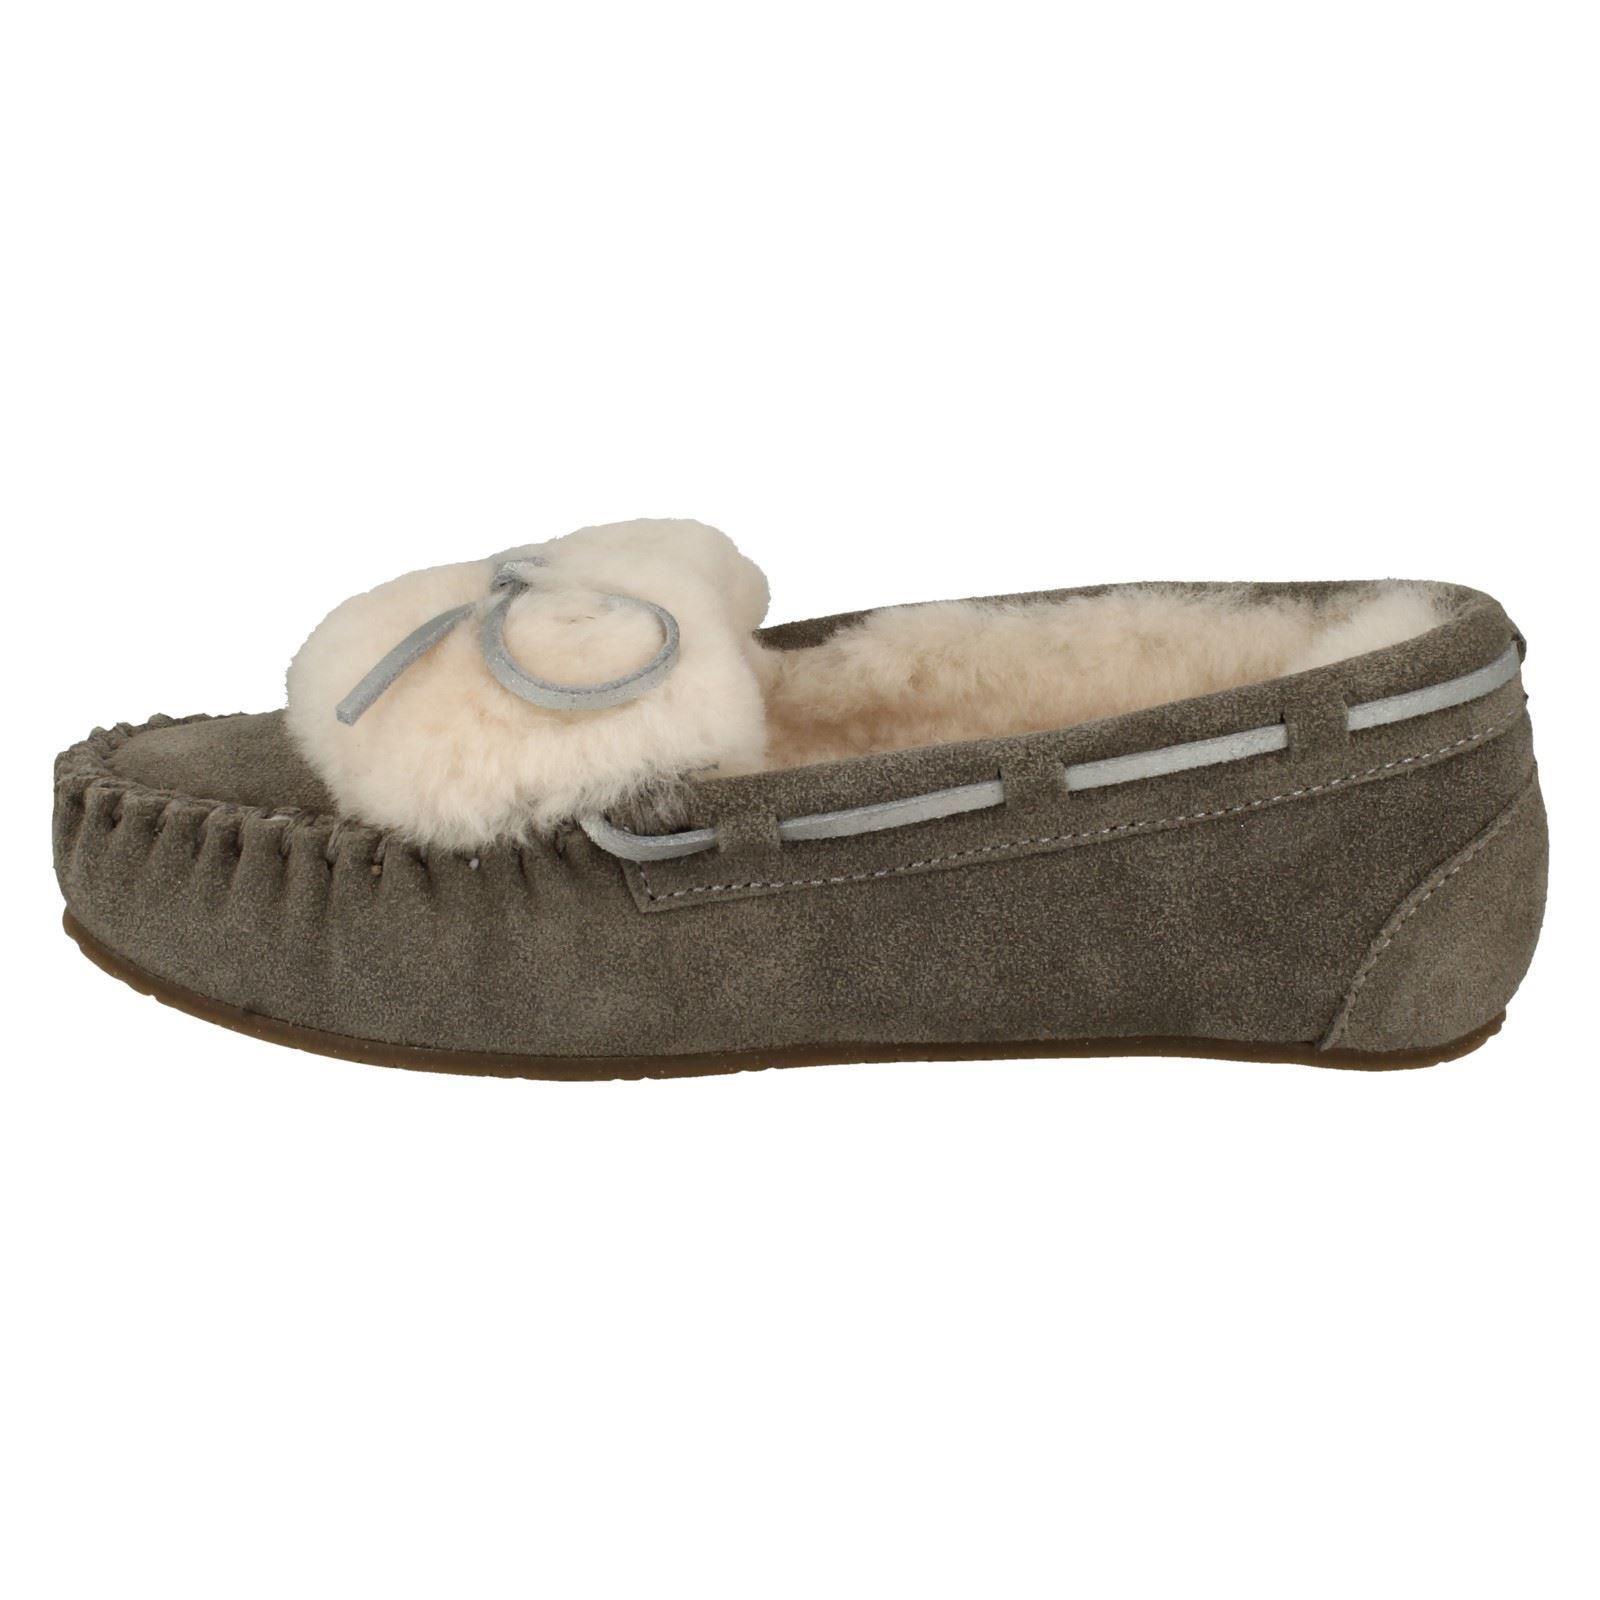 Glamour Cálido Forro Clarks Zapatillas Mujer aIwqOAn0